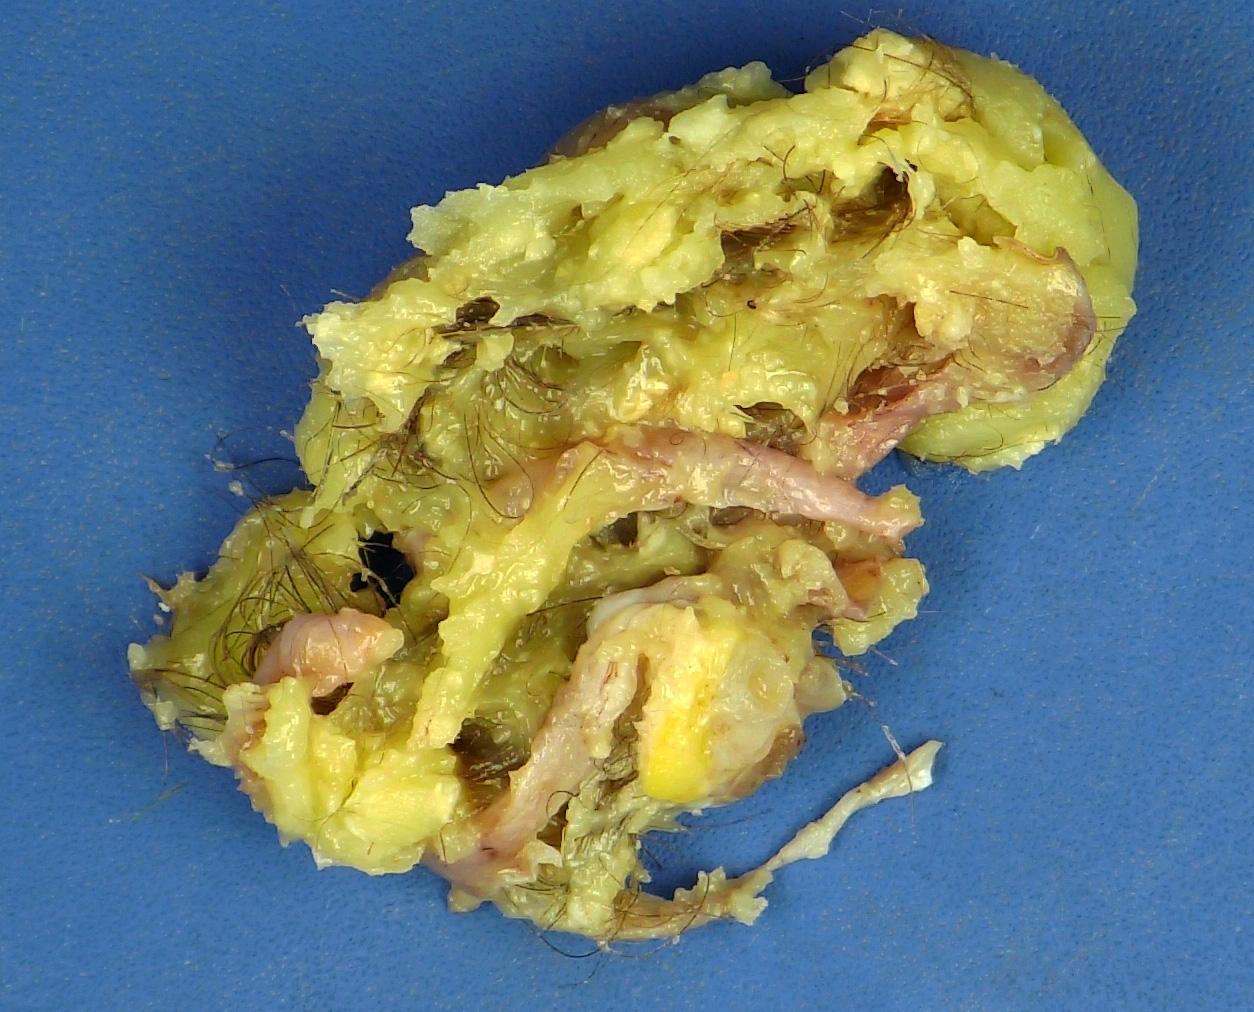 Ovarian mature teratoma